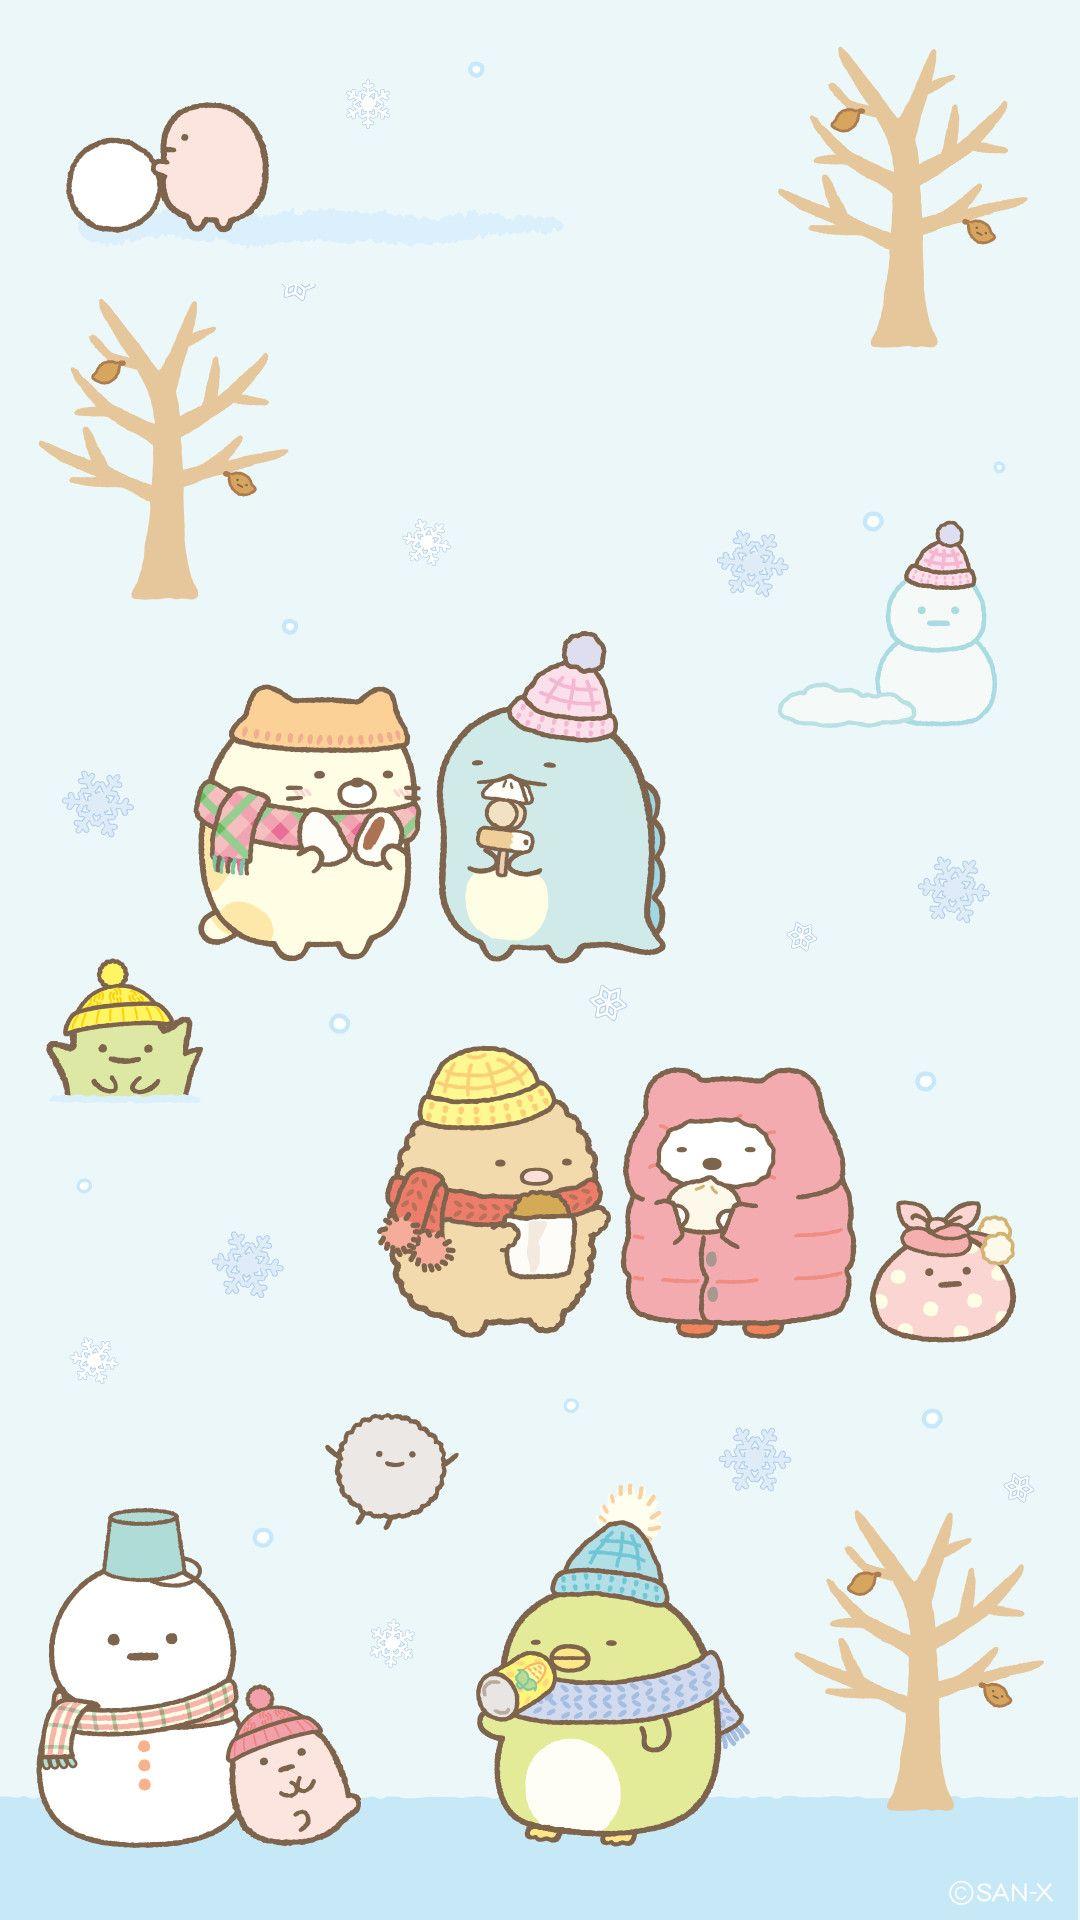 Cute Food Wallpaper Full Hd Hupages Download Iphone Wallpapers Wallpaper Iphone Cute Kawaii Wallpaper Kawaii Drawings